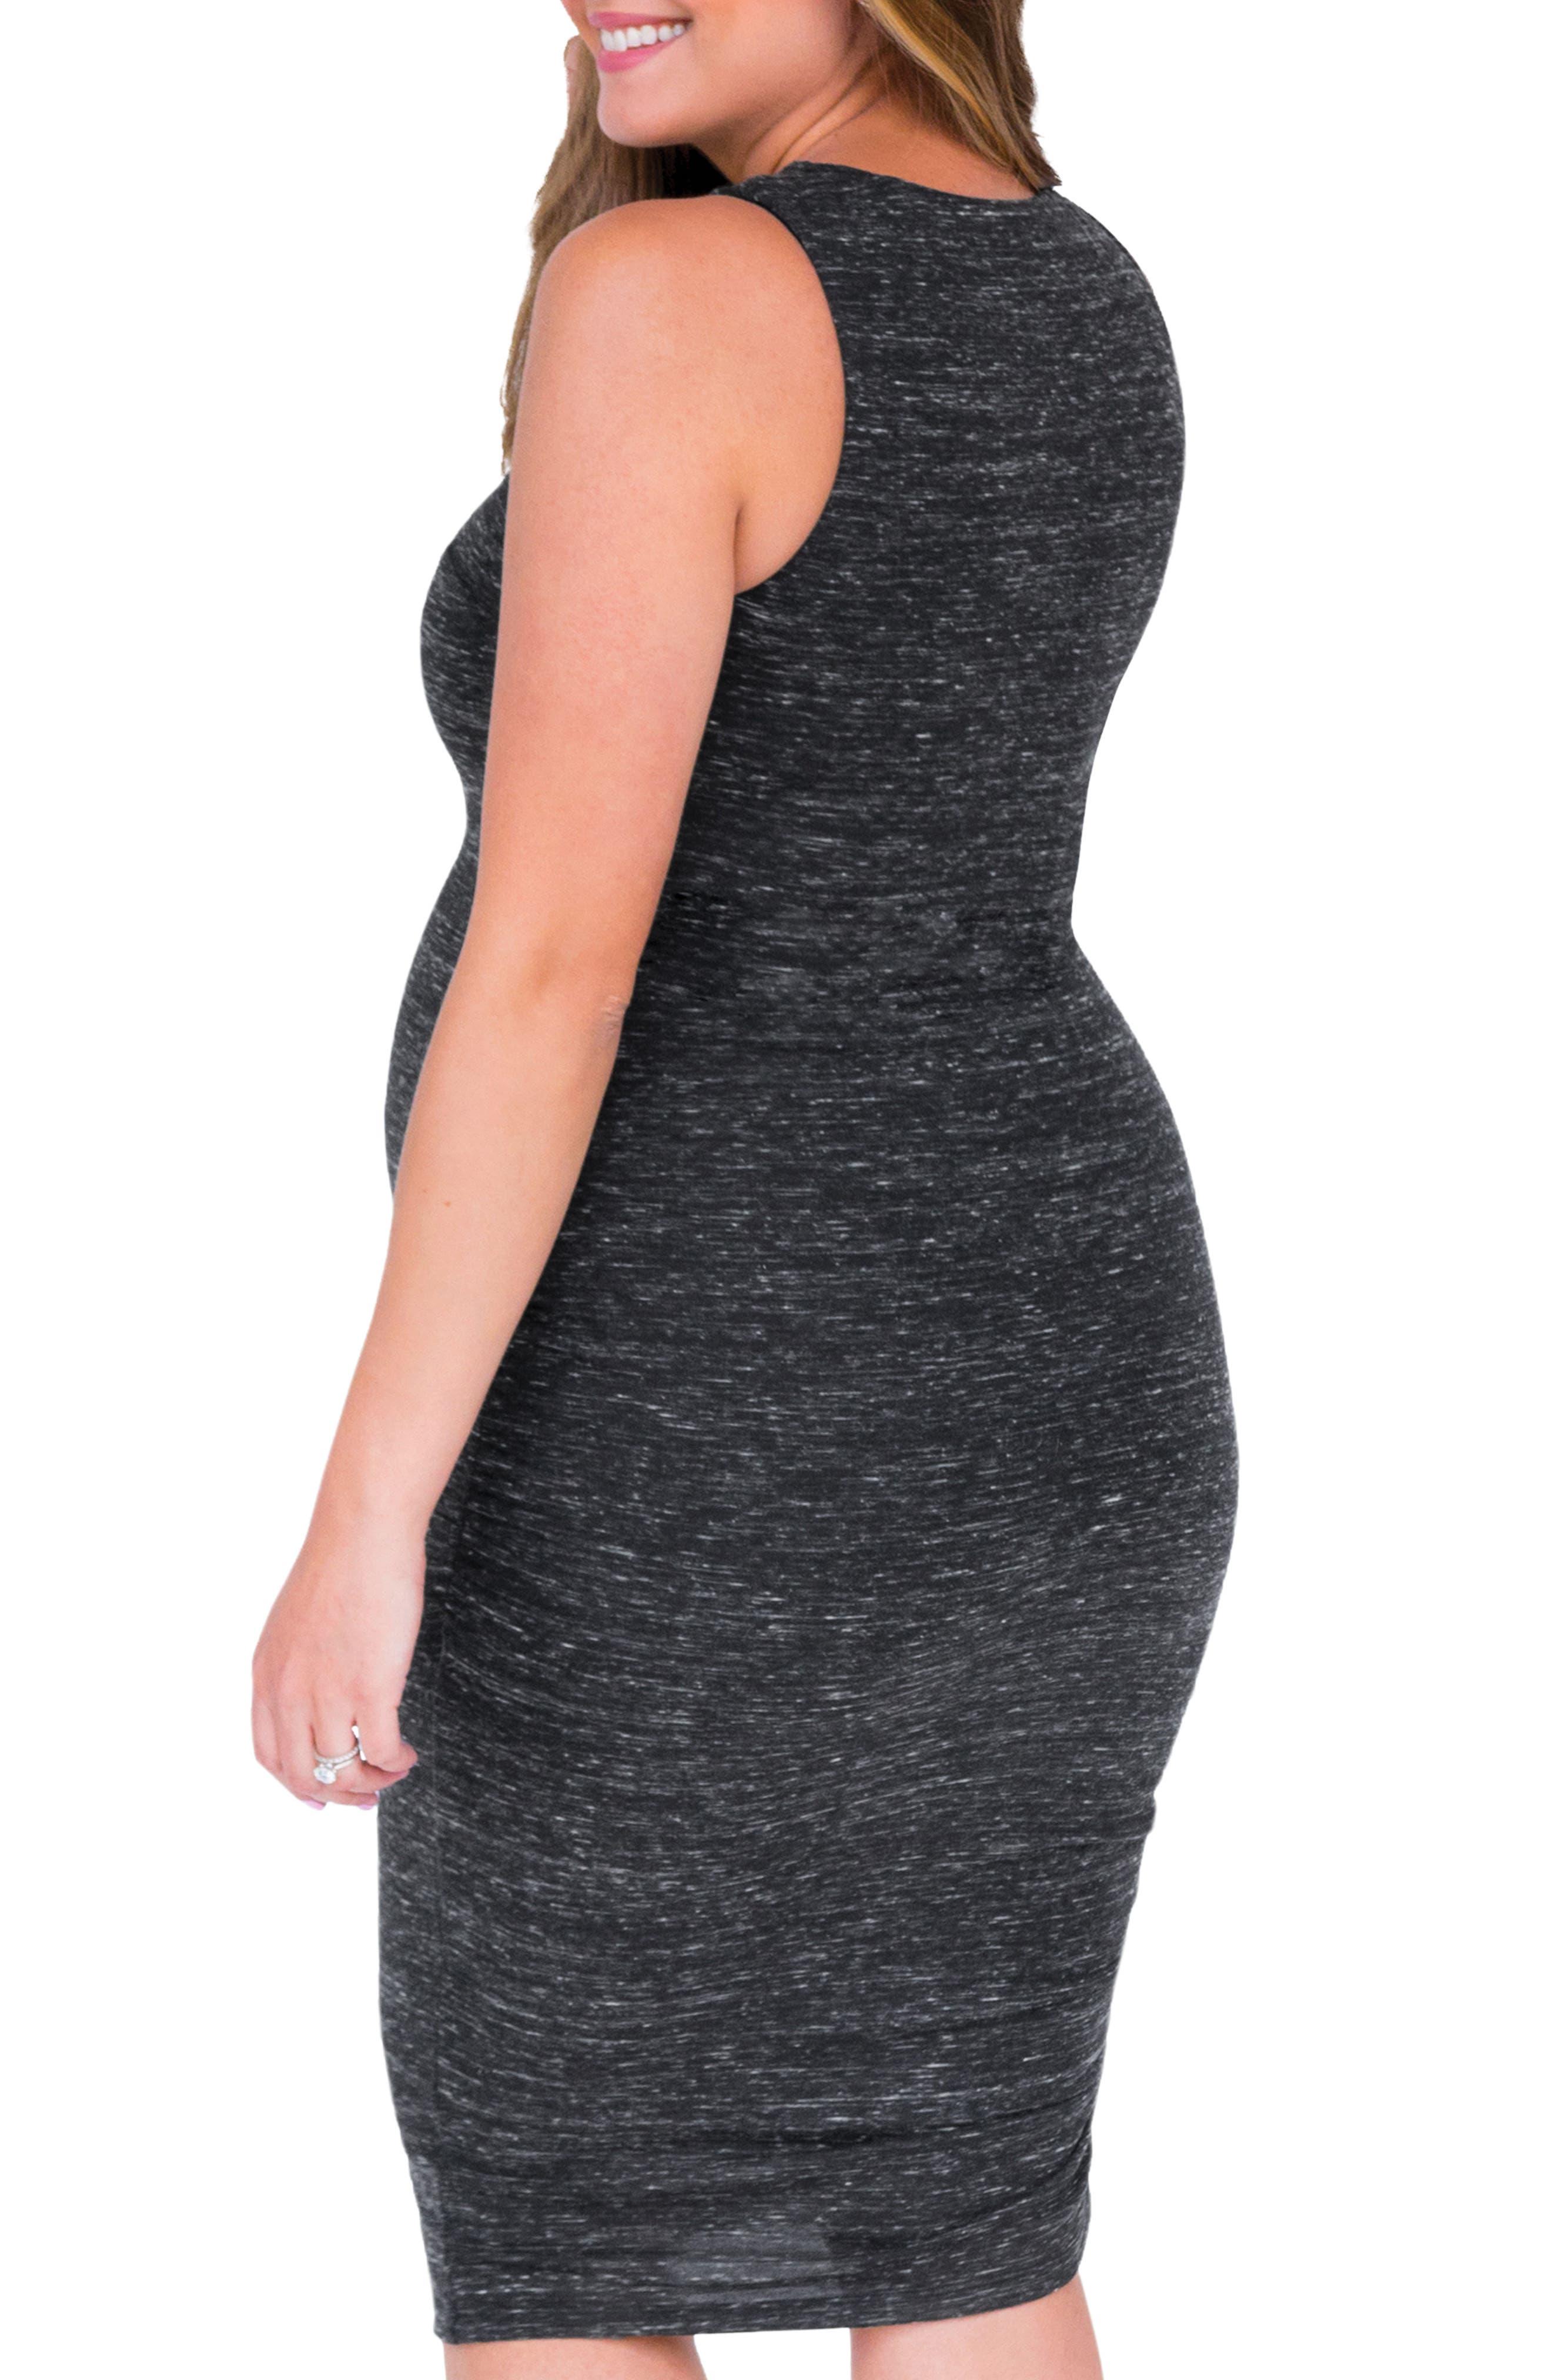 Alternate Image 2  - Belly Bandit® Perfect Ruched Maternity/Nursing Dress